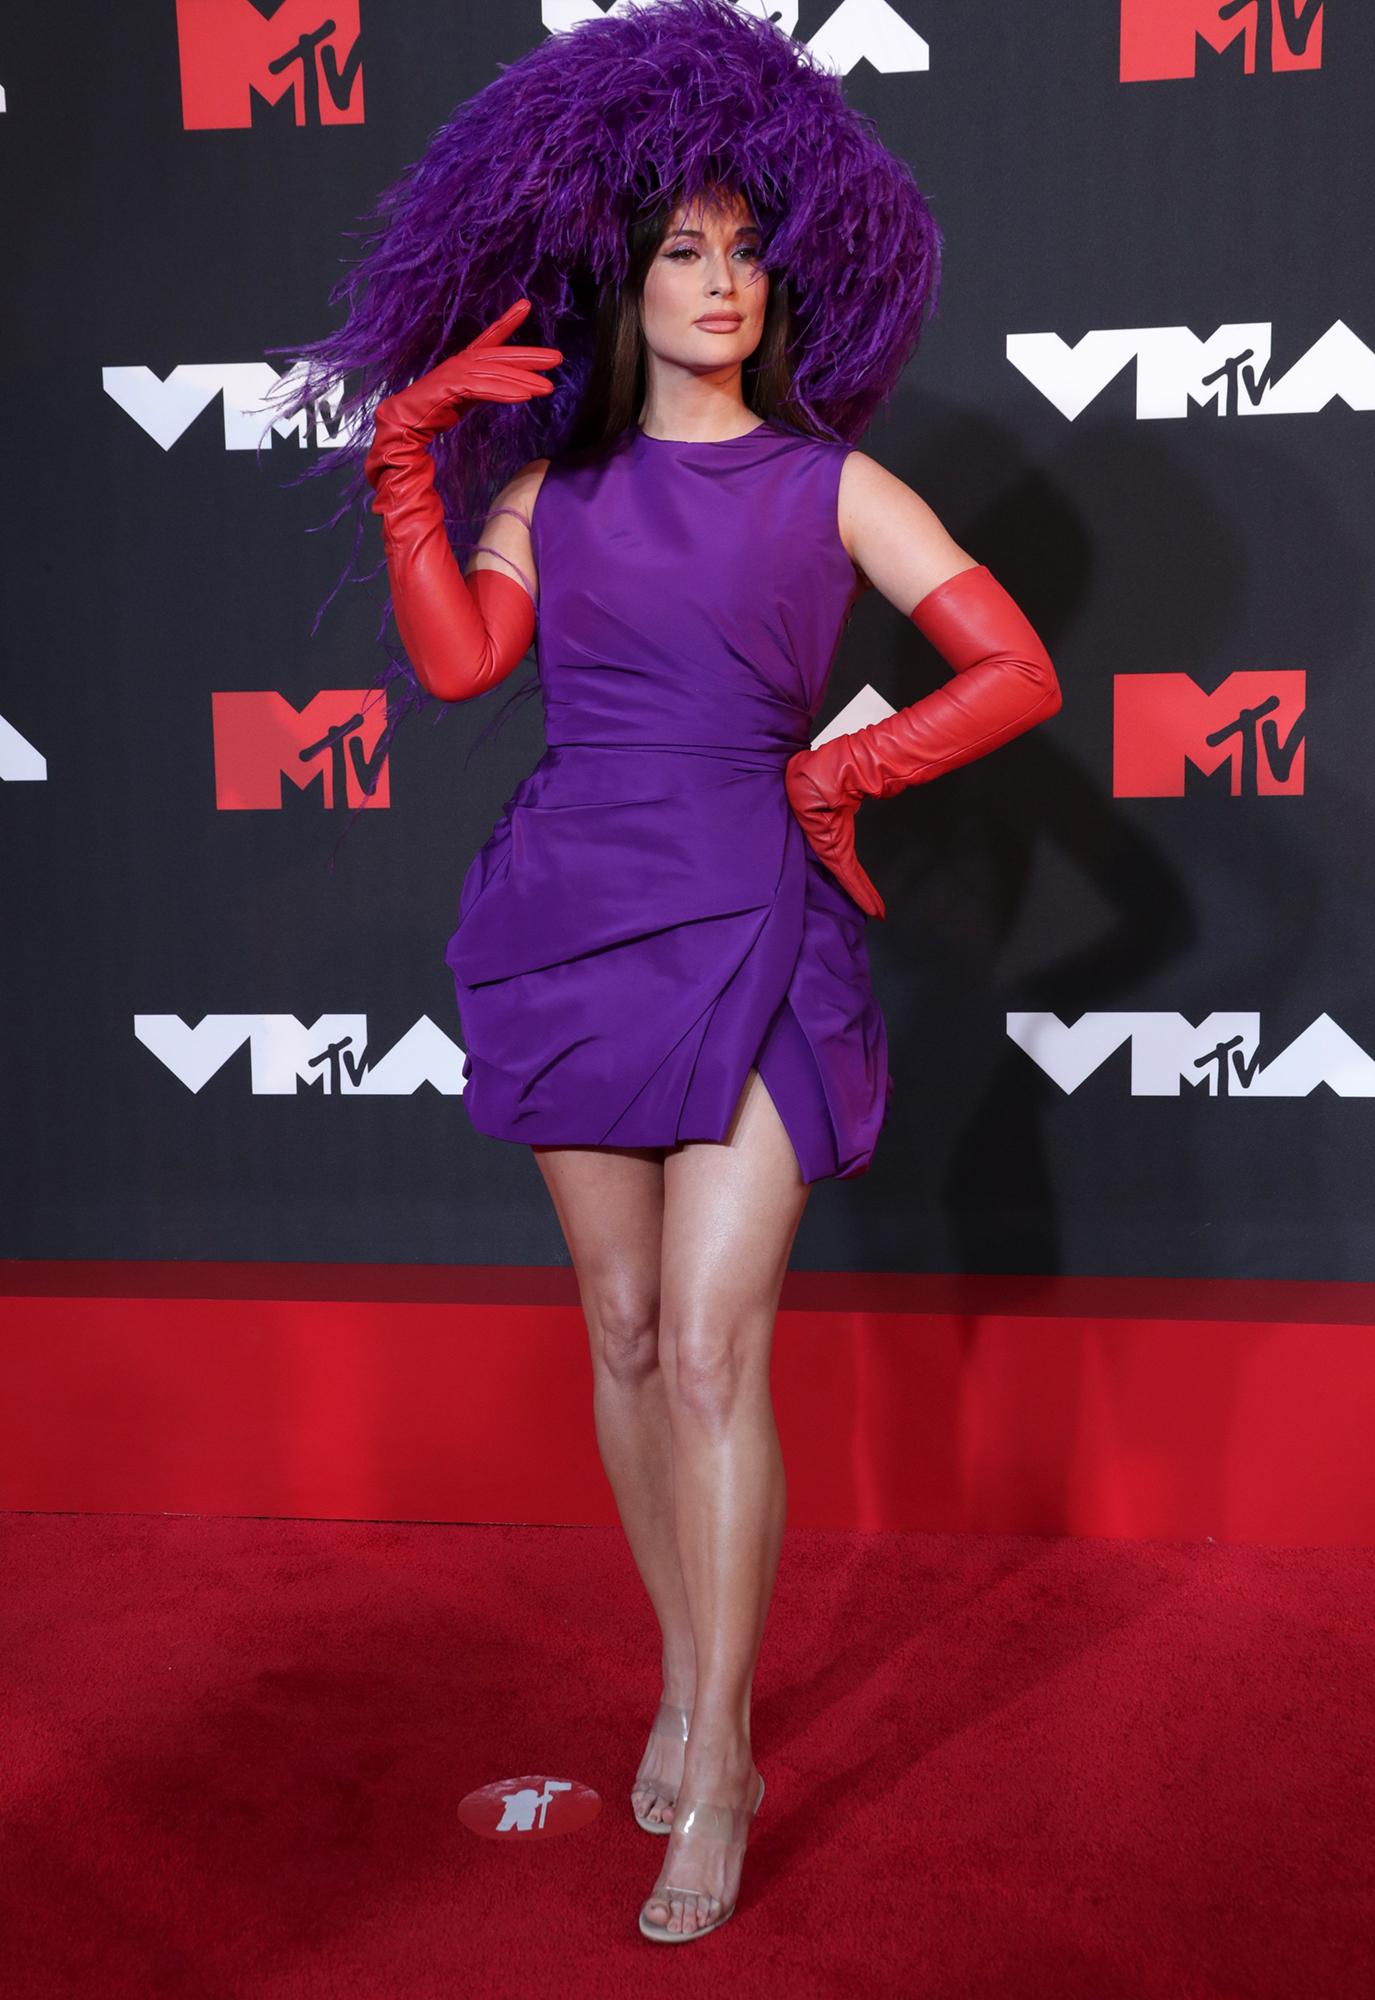 Kacey Musgraves at the 2021 MTV Video Music Awards